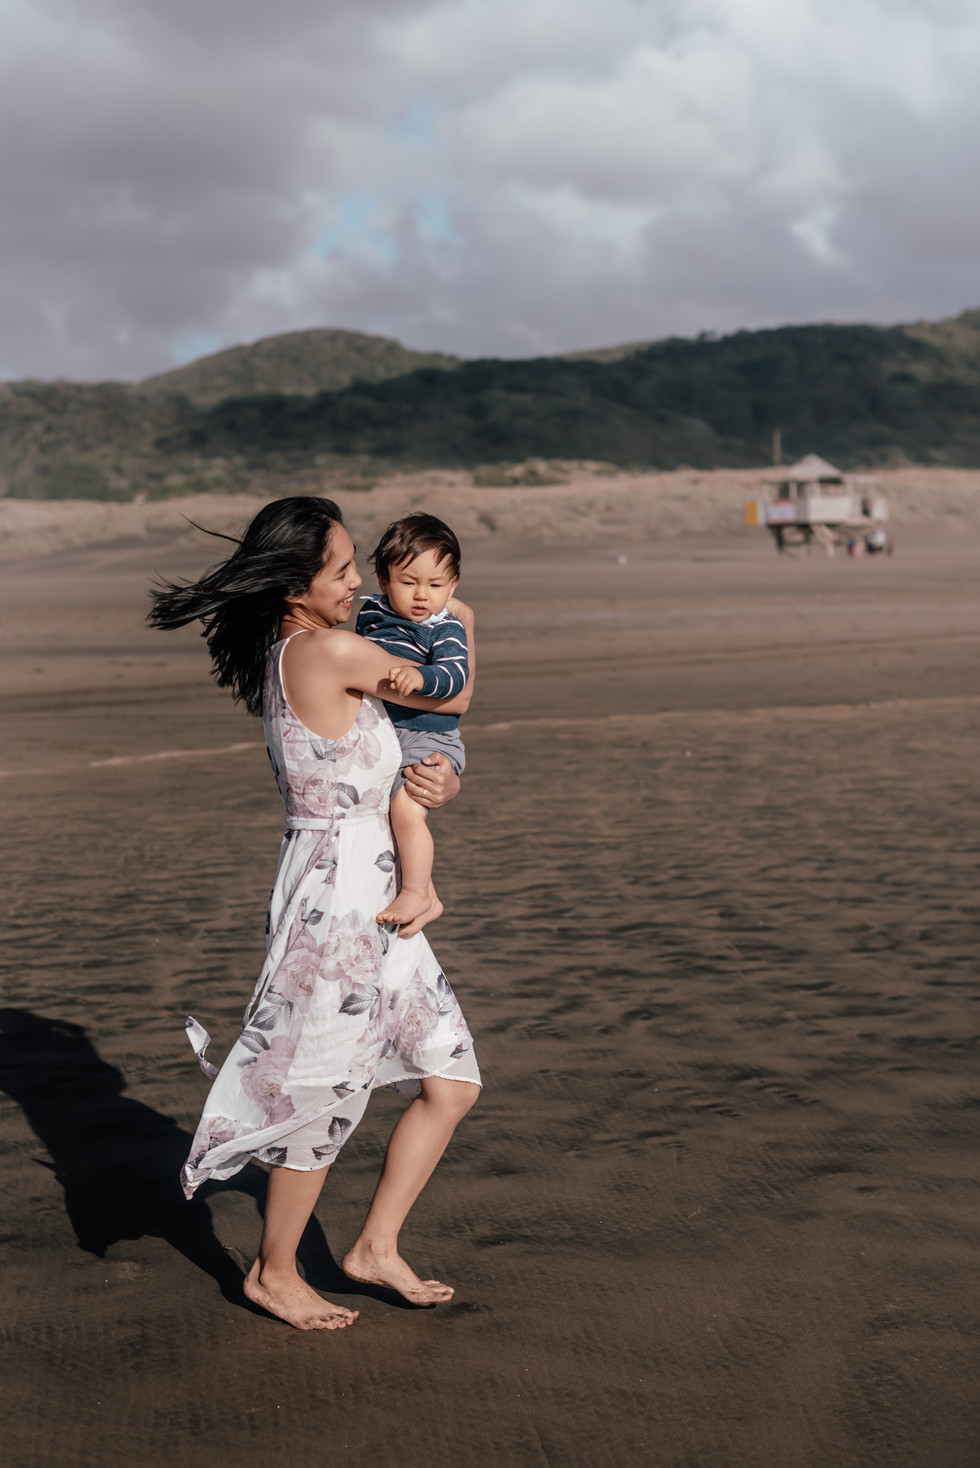 Family Beach Photoshoot | Bethells Beach Auckland New Zealand - www.zanthevorsatzphotography.com